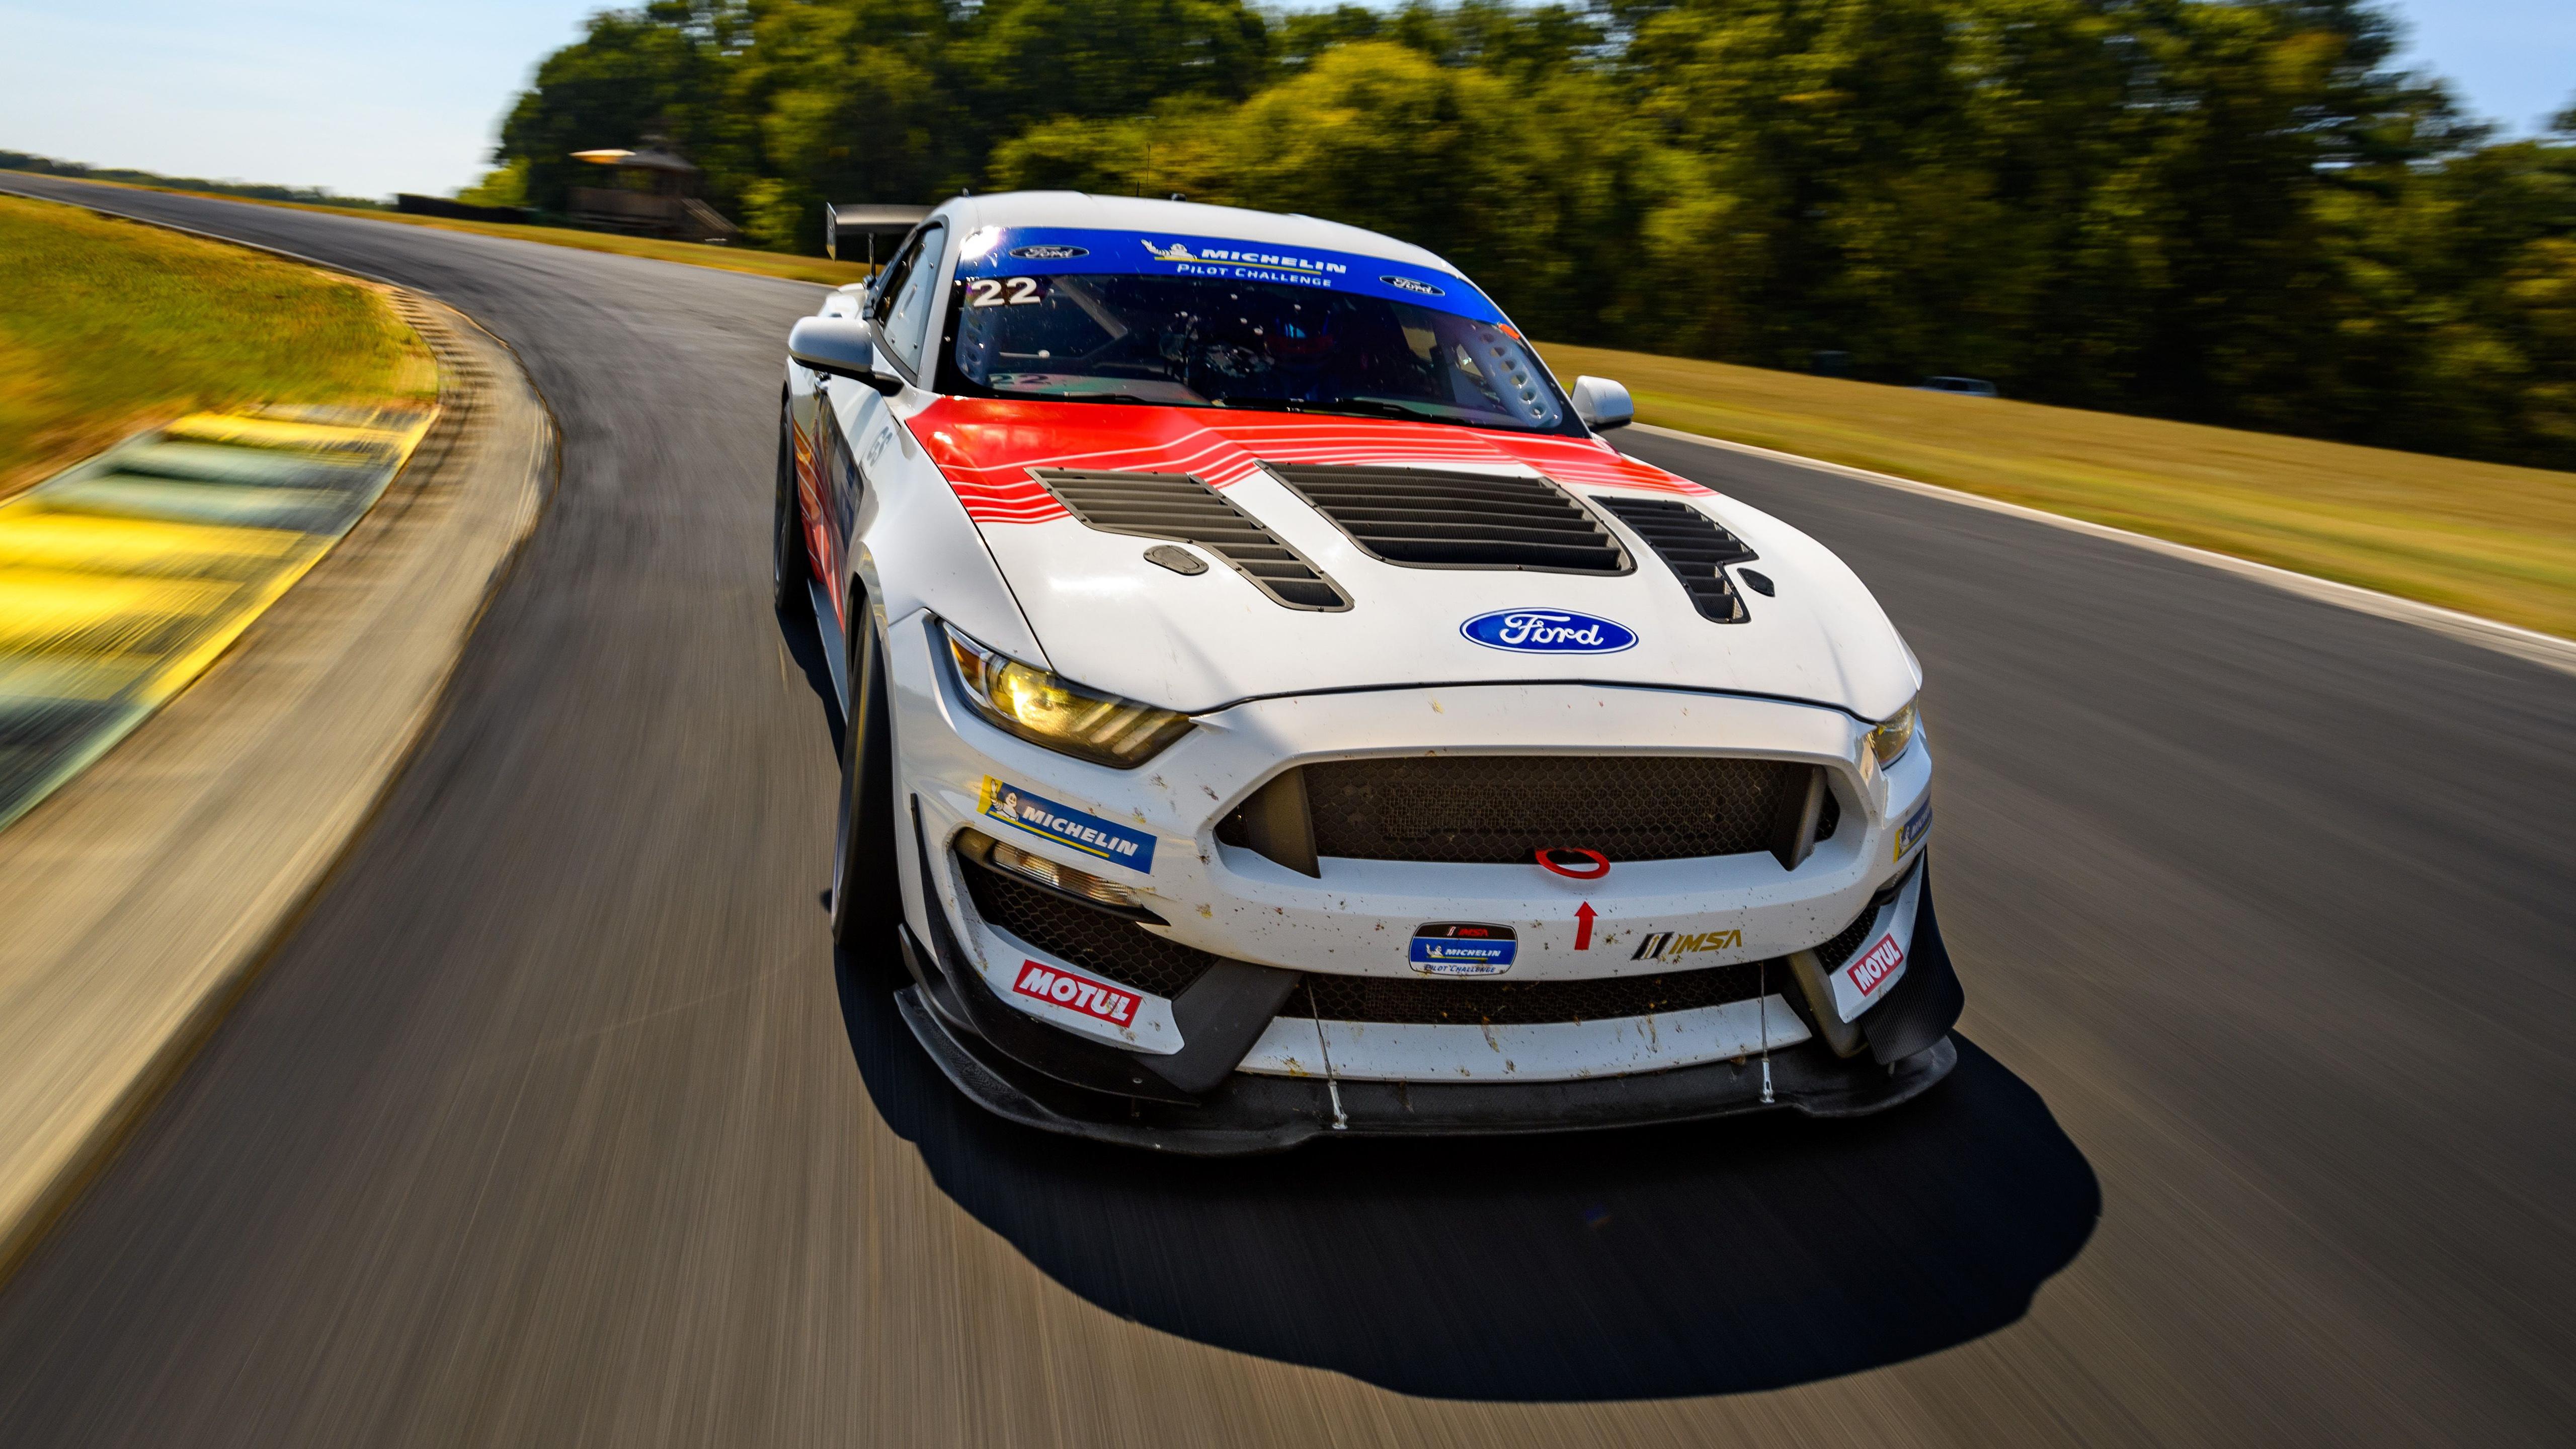 Ford Mustang Gt4 Race Car 4k 5k Wallpaper Hd Car Wallpapers Id 14058